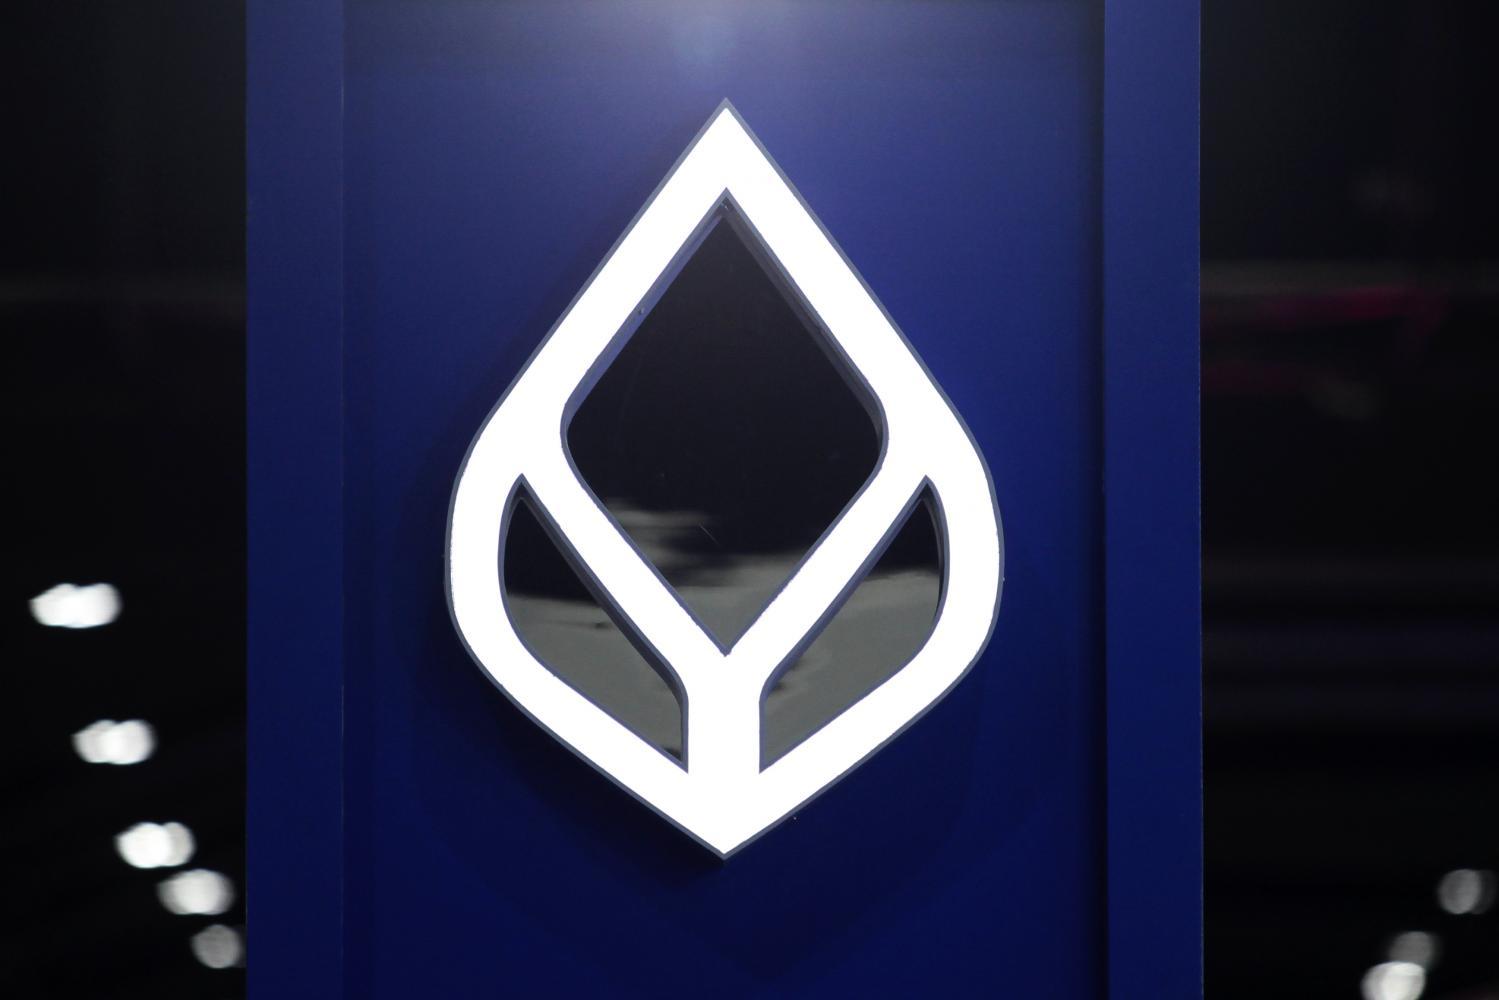 Bangkok Bank has 2.5 million credit cardholders. Patipat Janthong